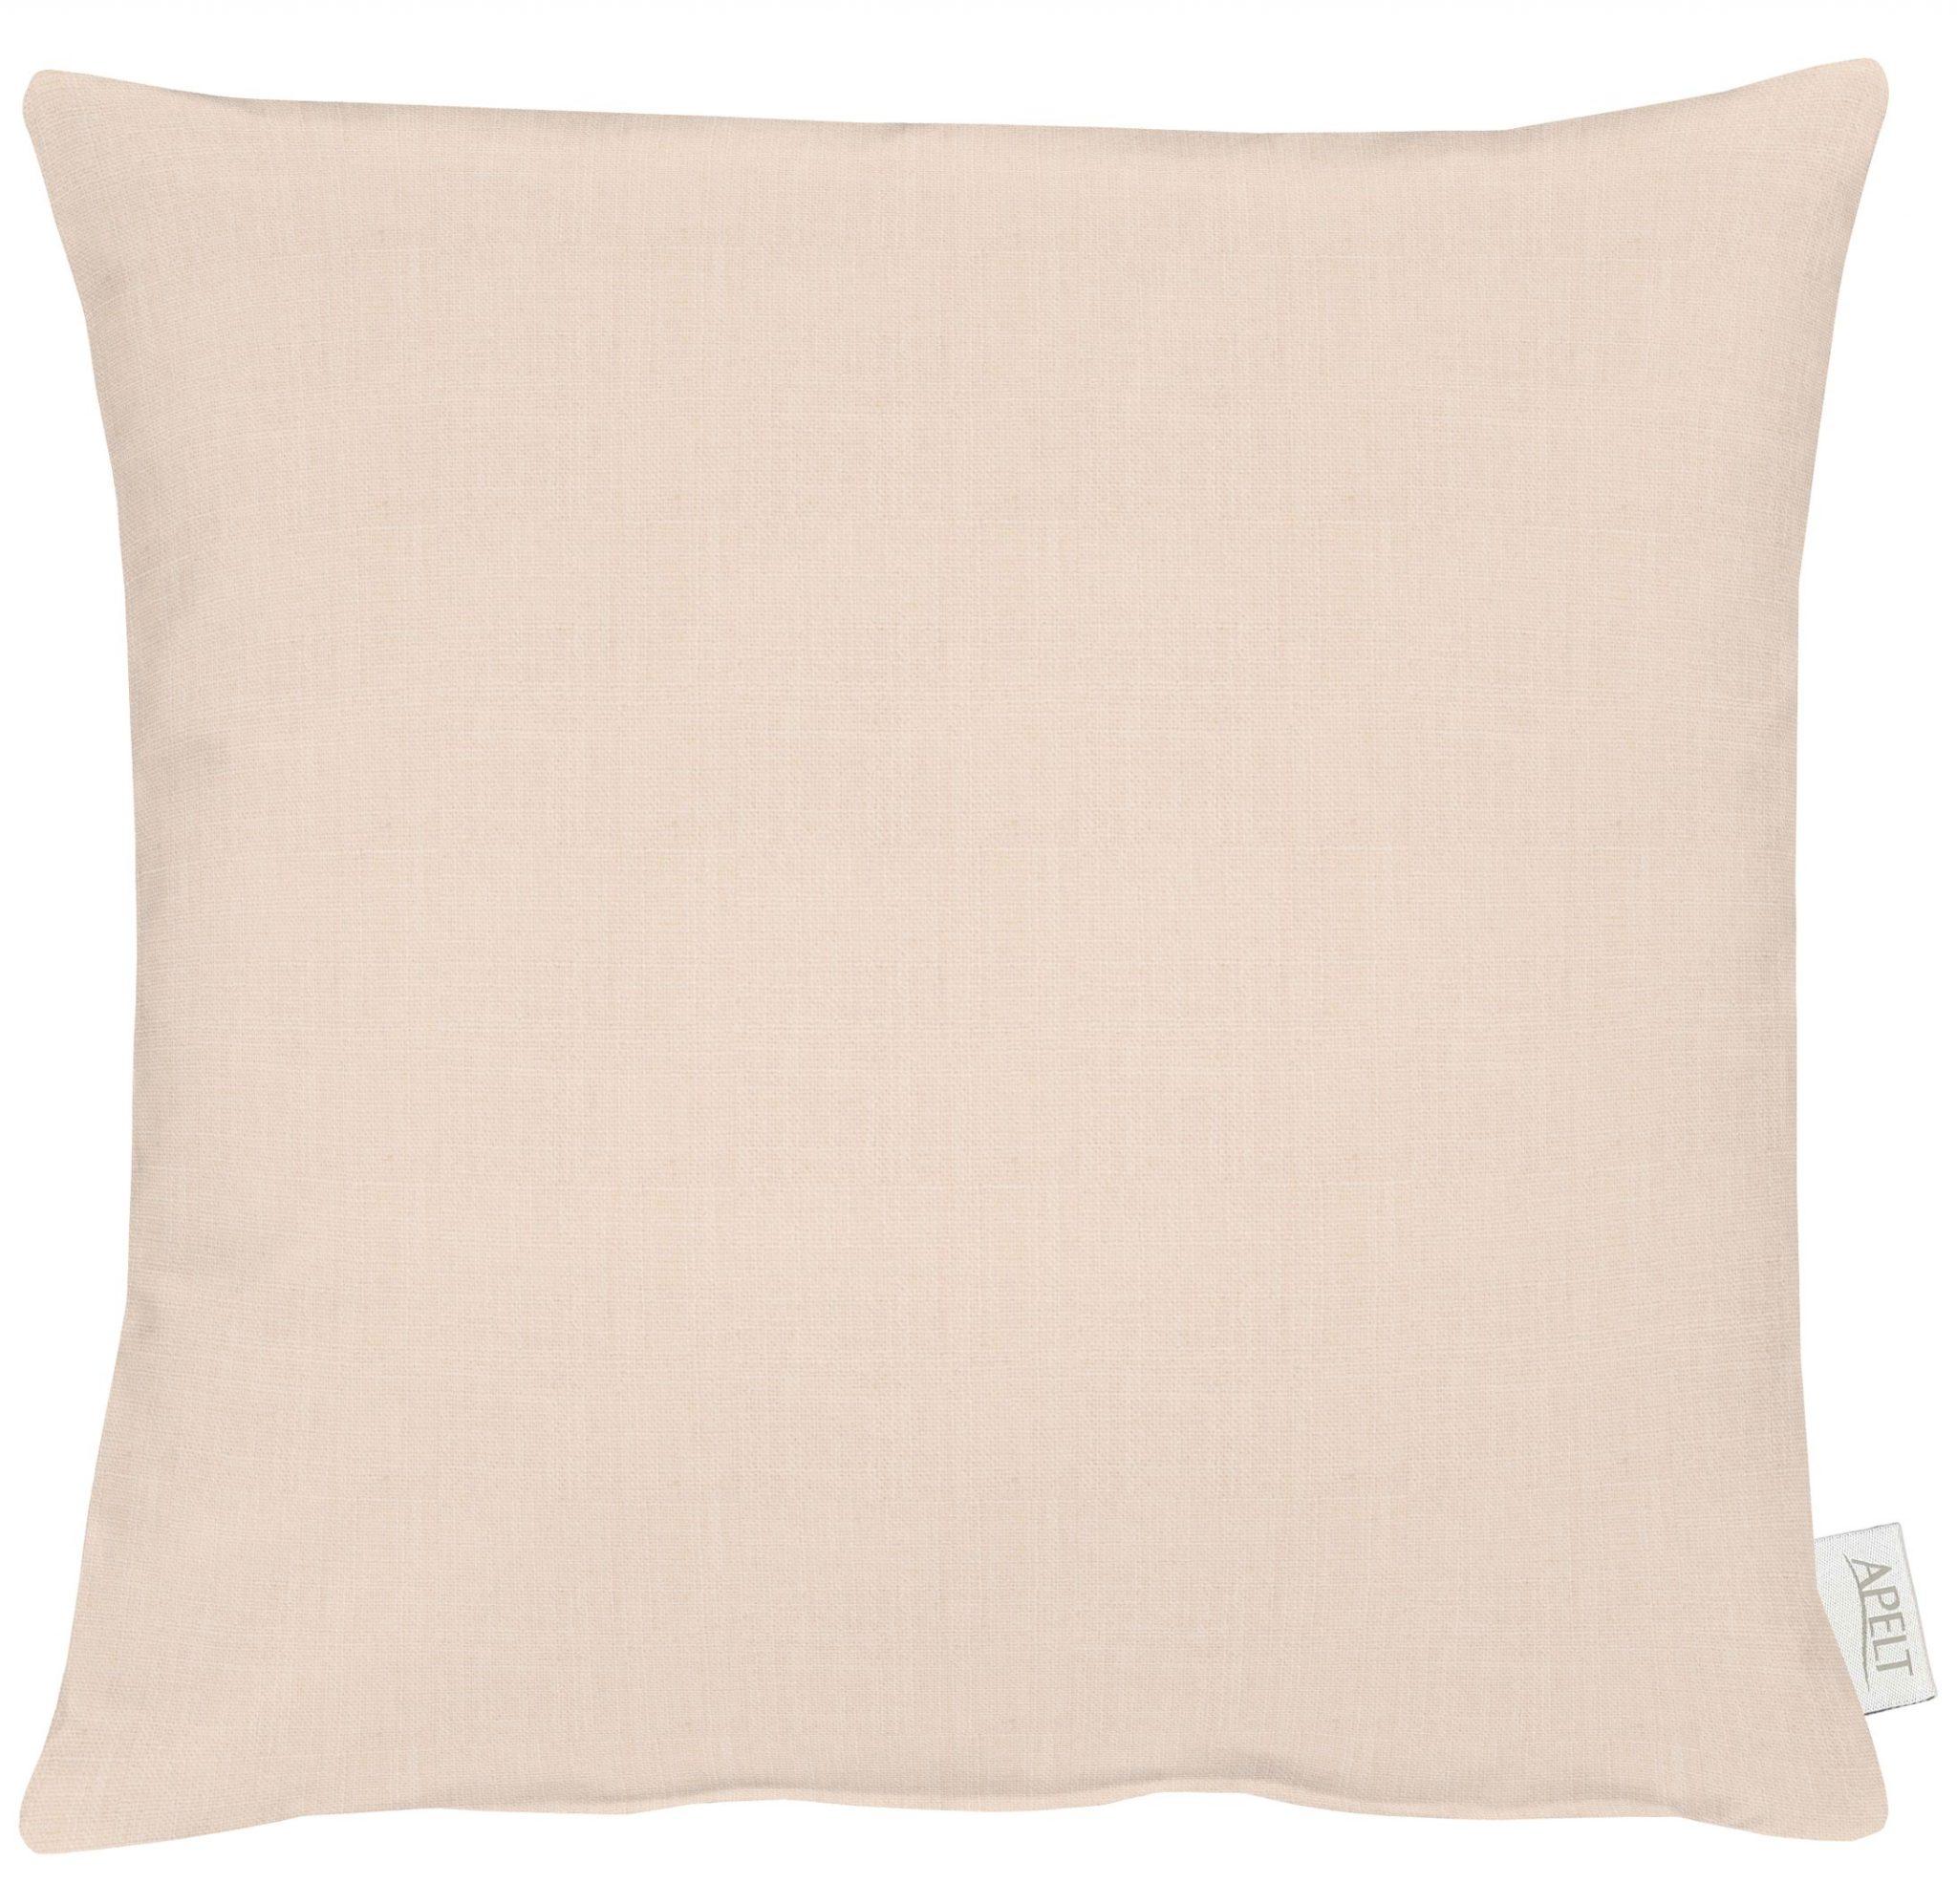 Dekokissen Apelt ARIZONA rosé 45x45c